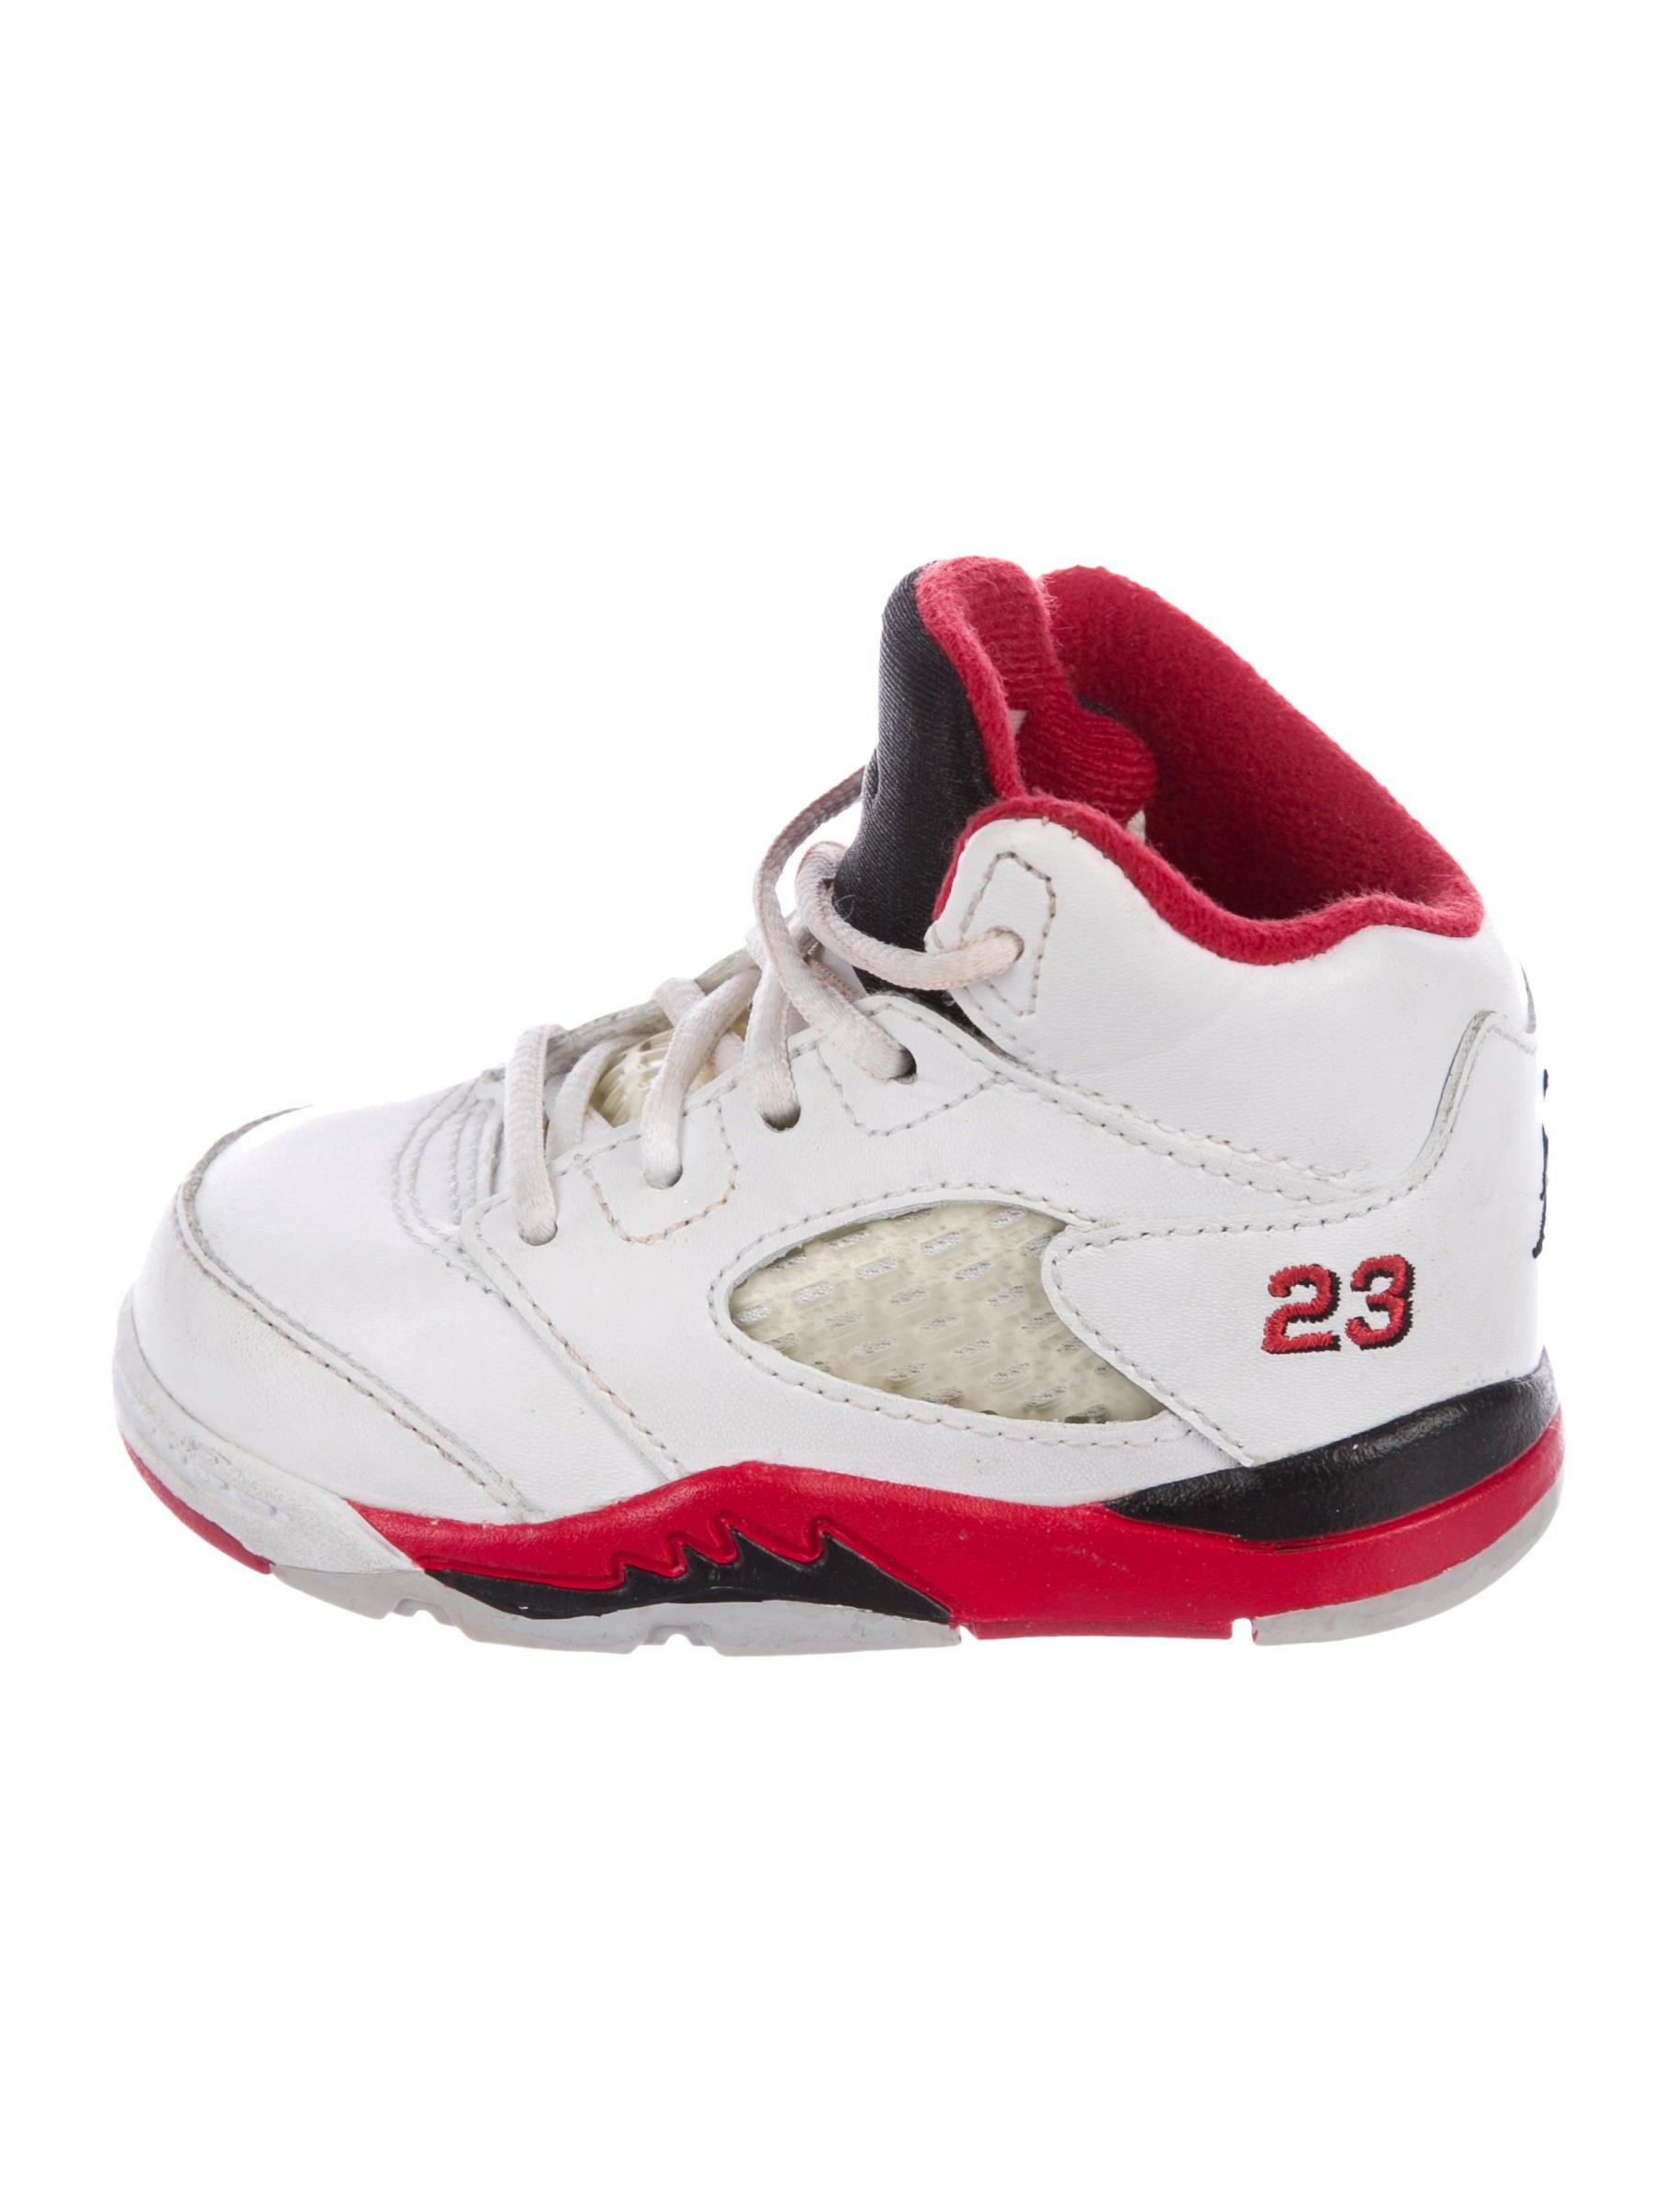 premium selection 6afbe 9ba54 Nike Air Jordan Boys  5 Retro Sneakers - Boys - WNIAJ20777   The ...